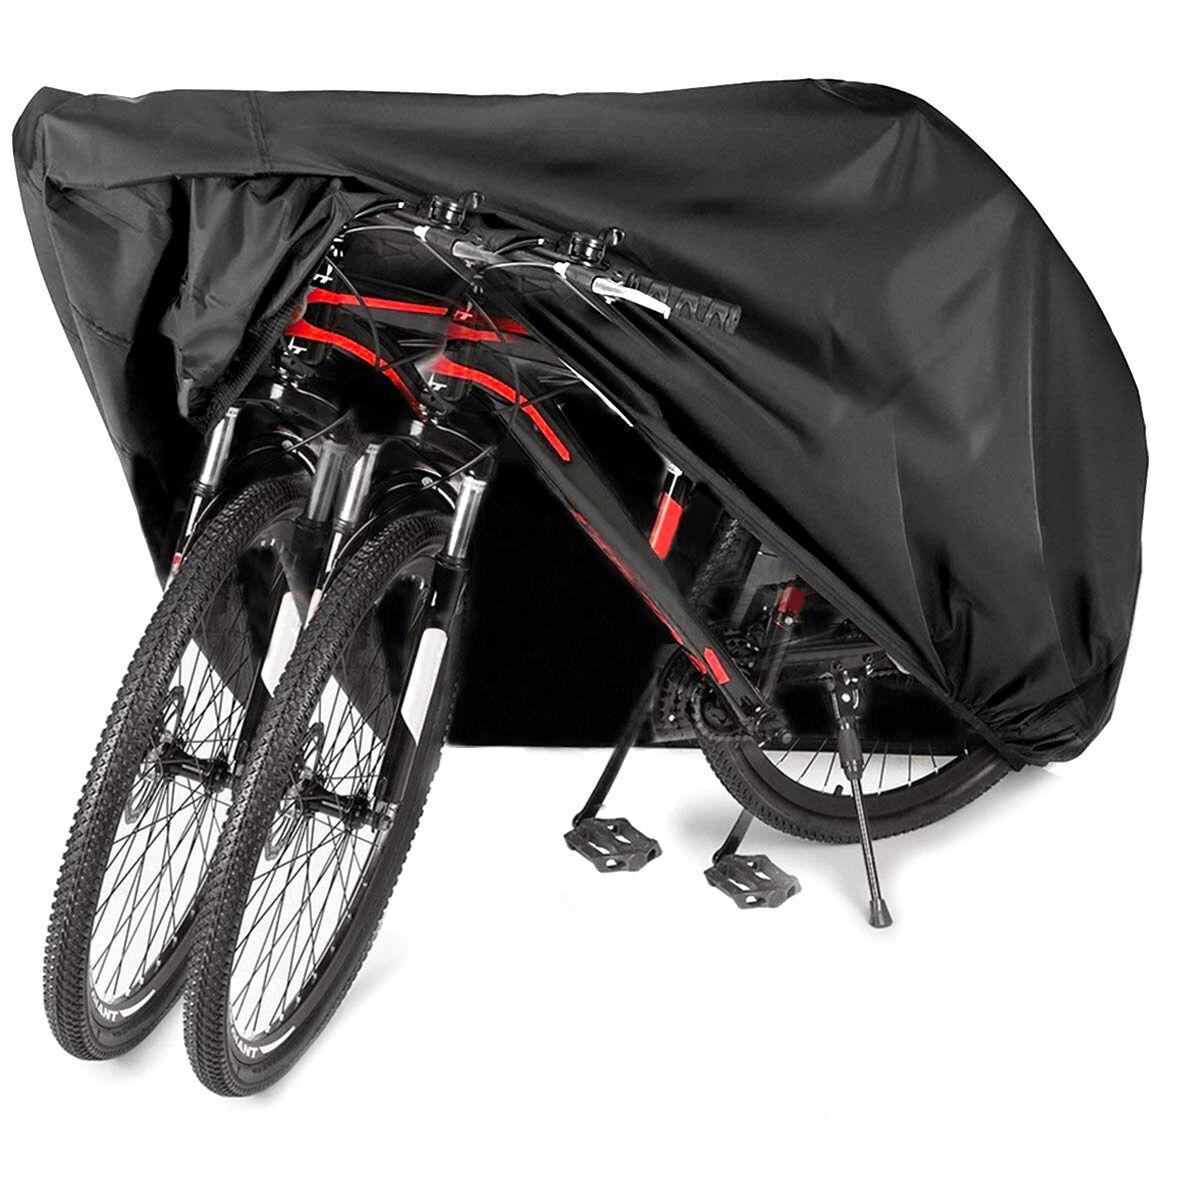 Audew For 2-3 Bikes, Waterproof Outdoor Bicycle Cover